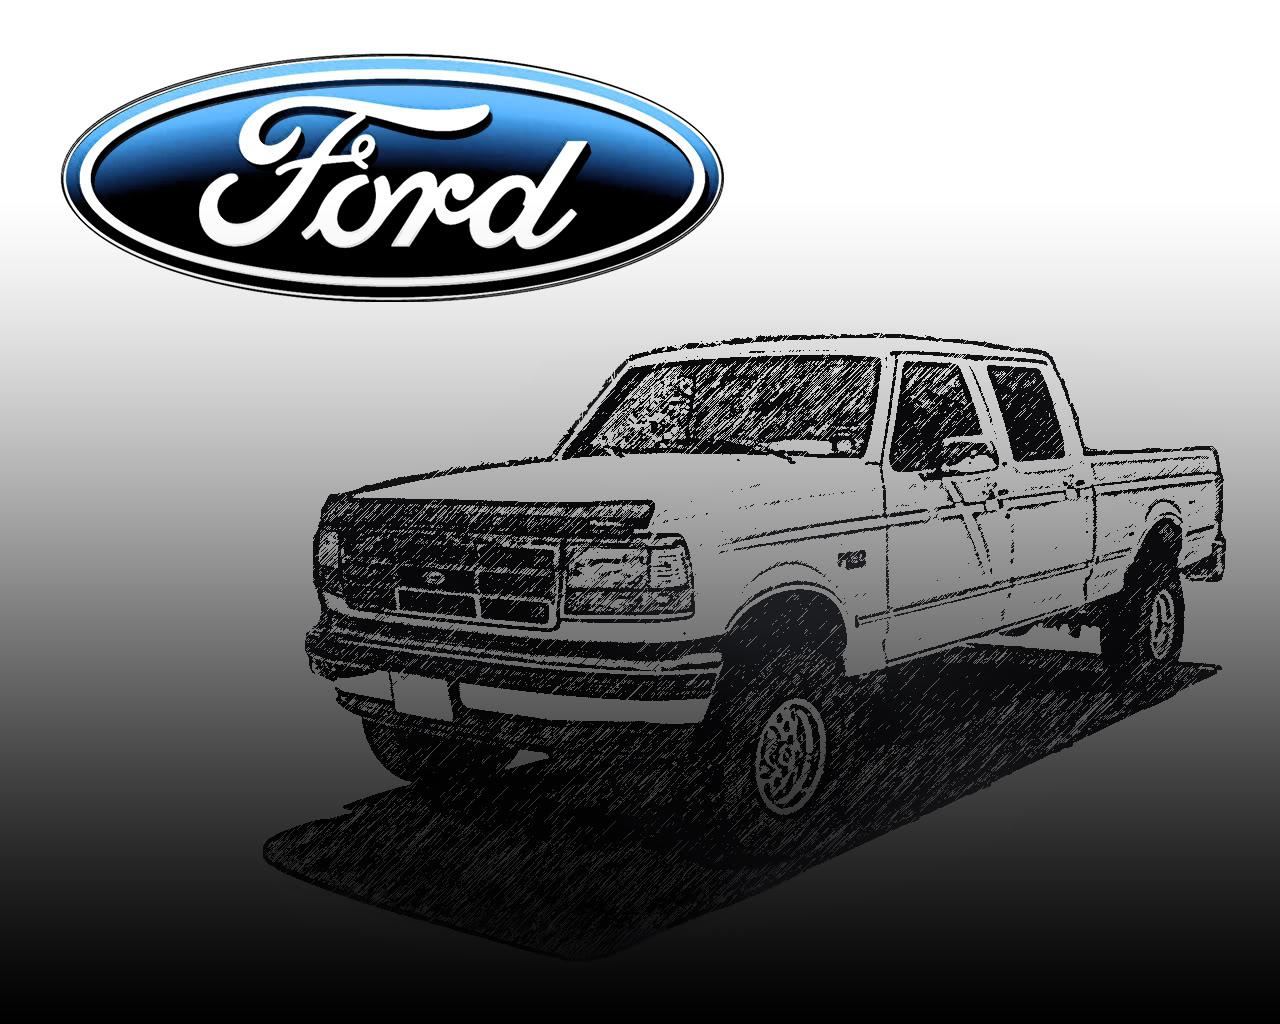 Classic Ford Truck Wallpaper - WallpaperSafari